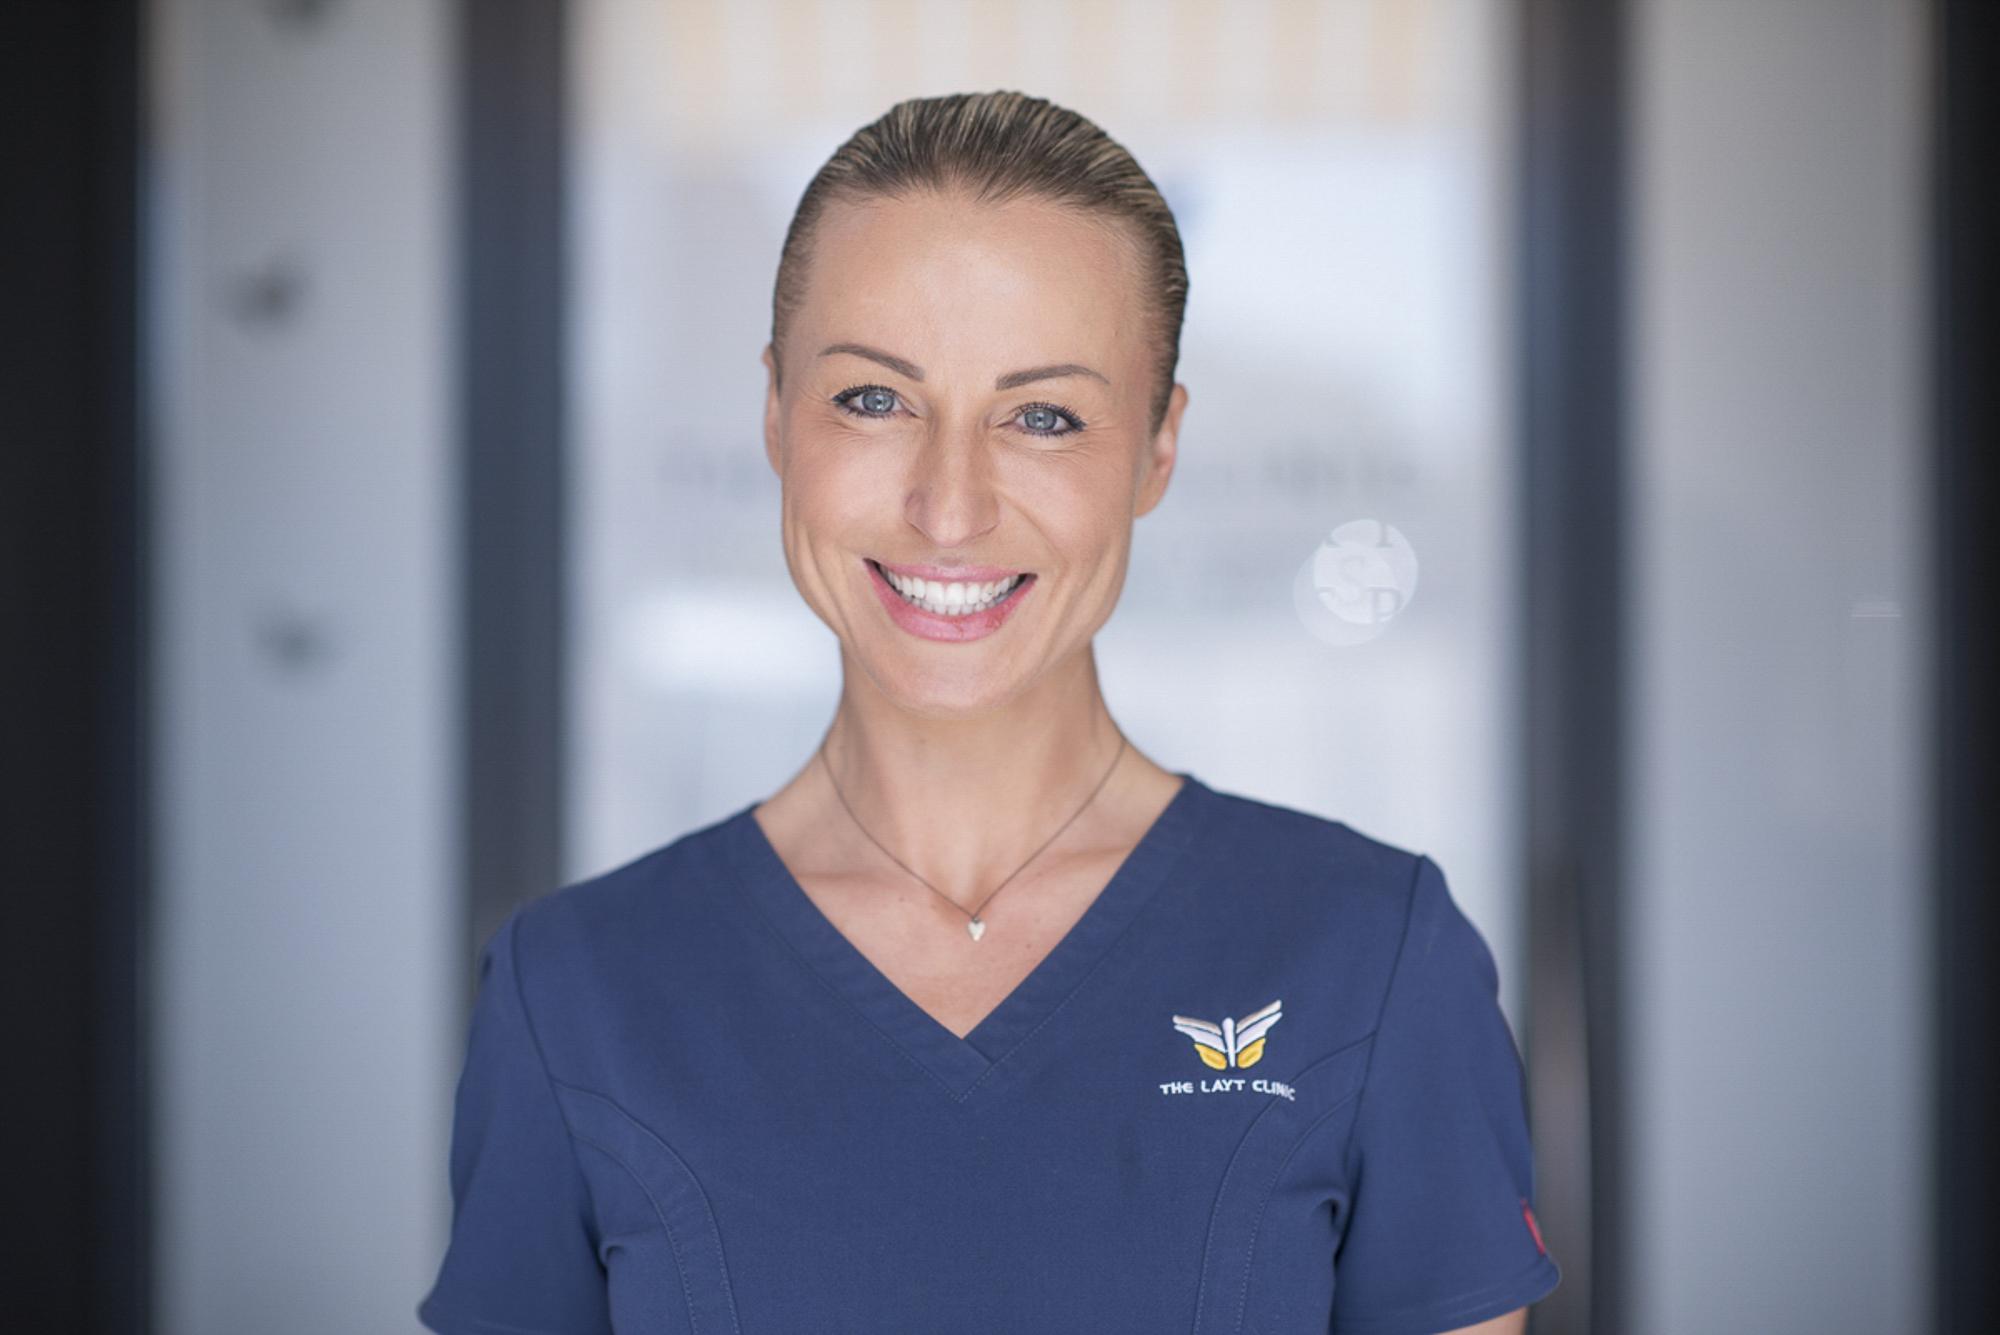 The Layt Clinic, anaesthetic nurse specialist portrait